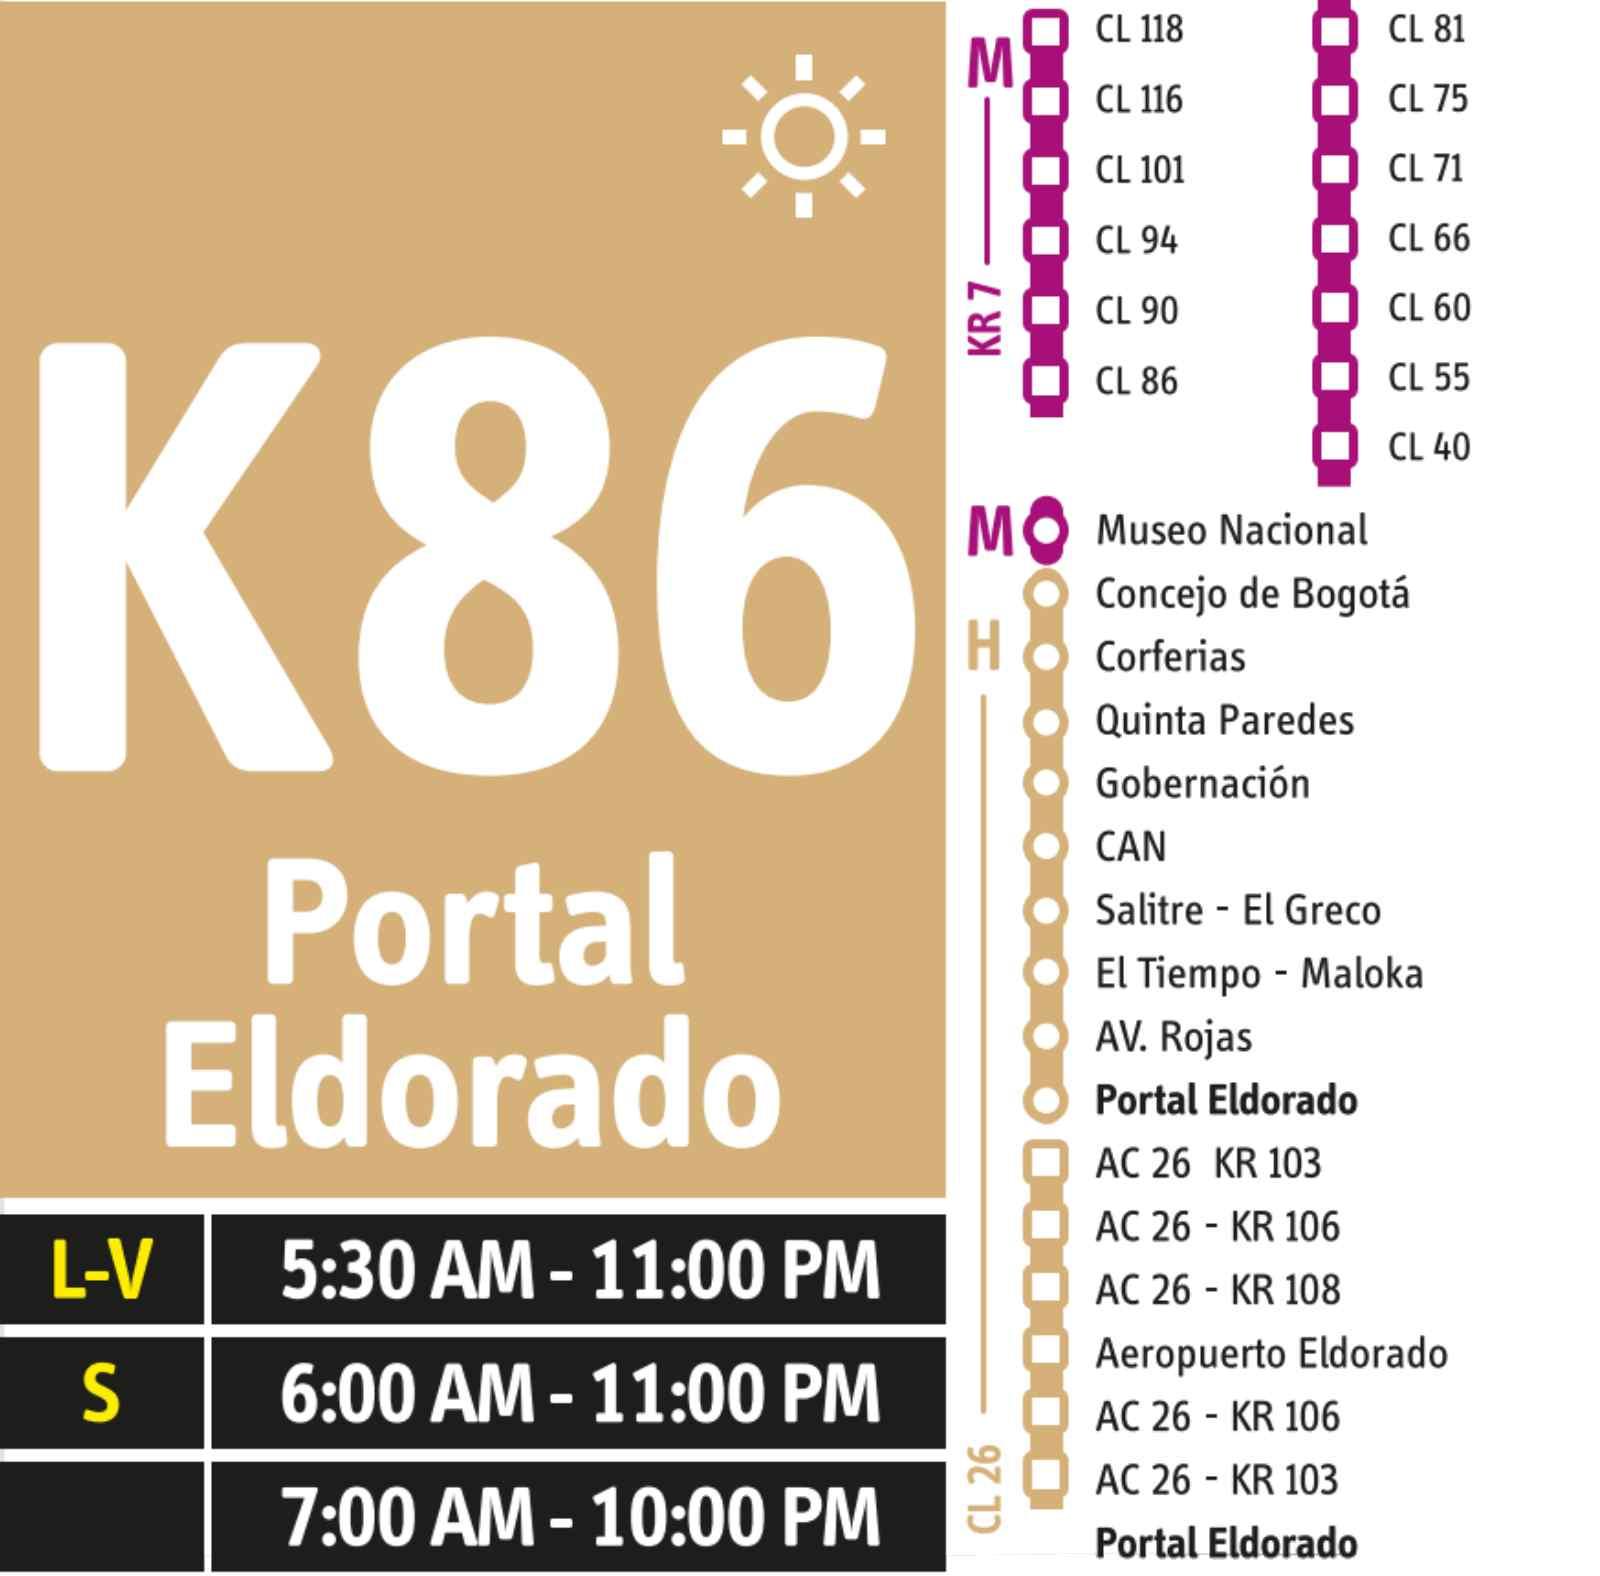 K86 > Aeropuerto Eldorado (dual)